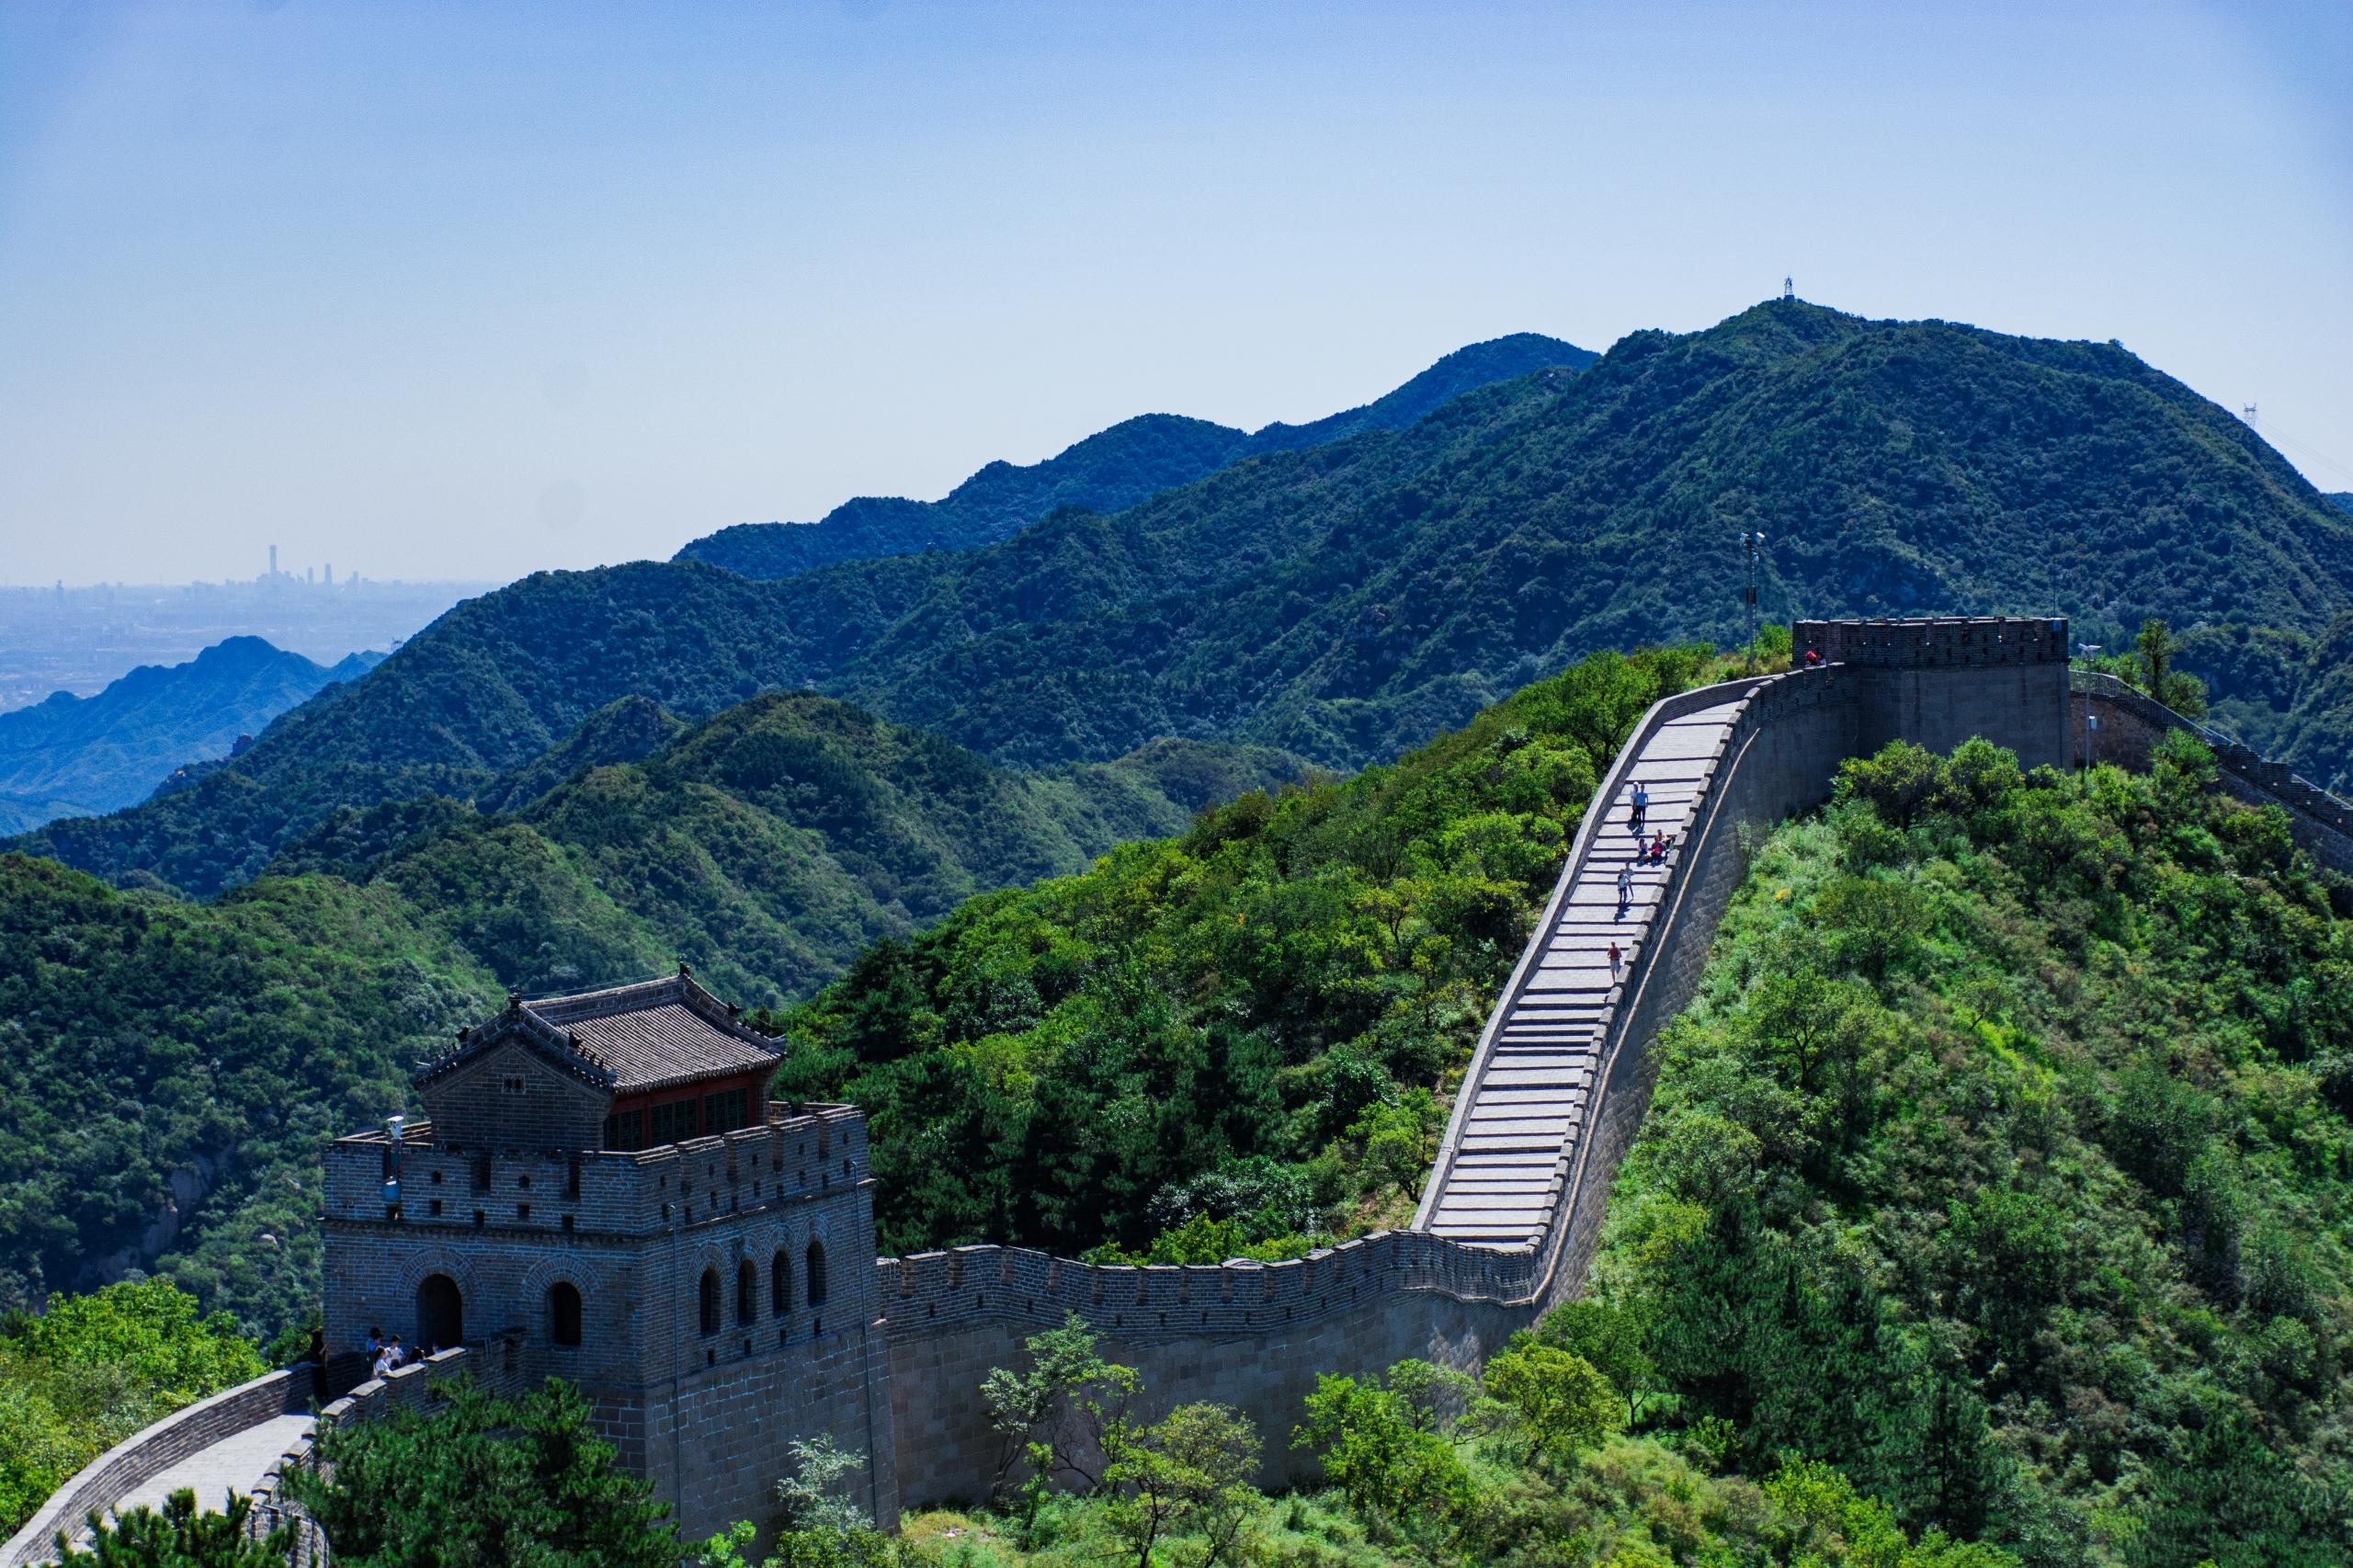 photos - china, beijing, greatwallofchina - liuisj98 | ello